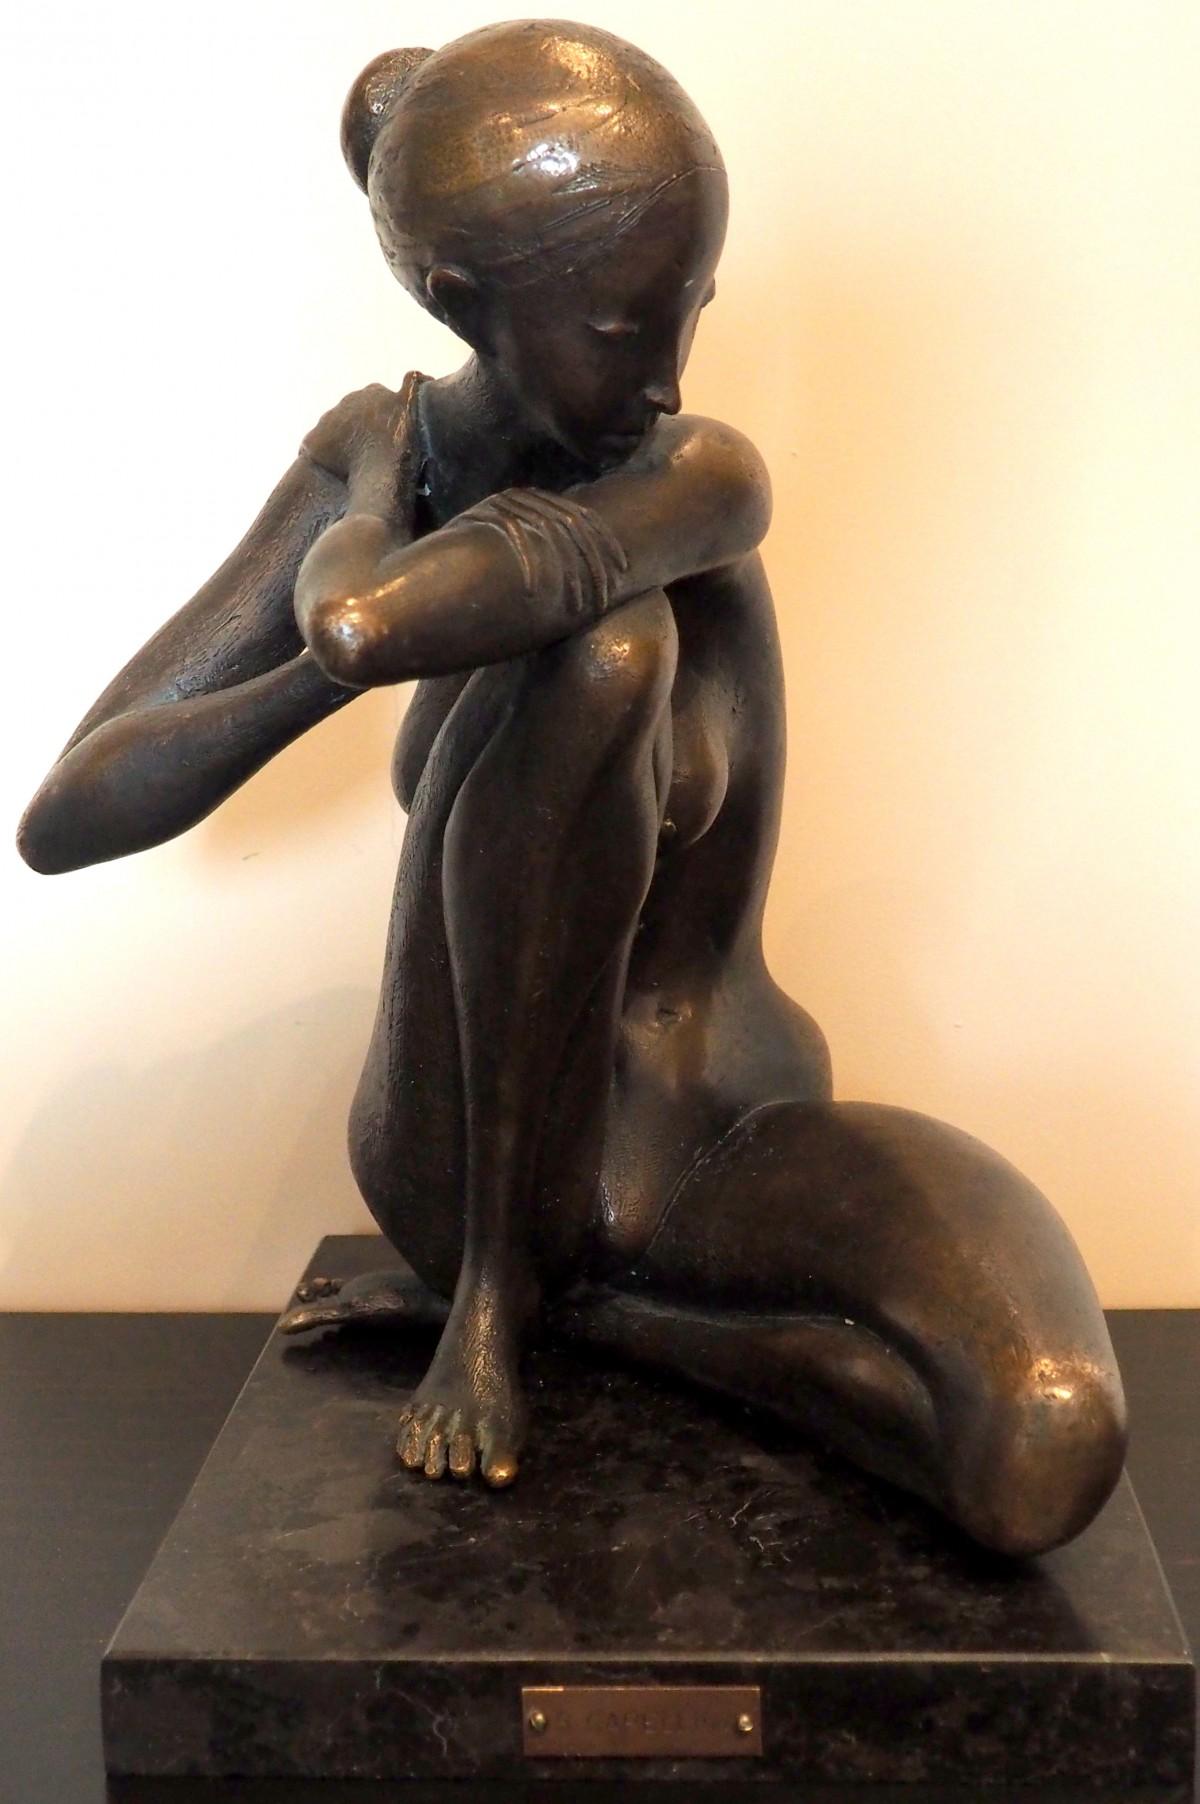 Раменская незнакомка скульптура фото бронзовая